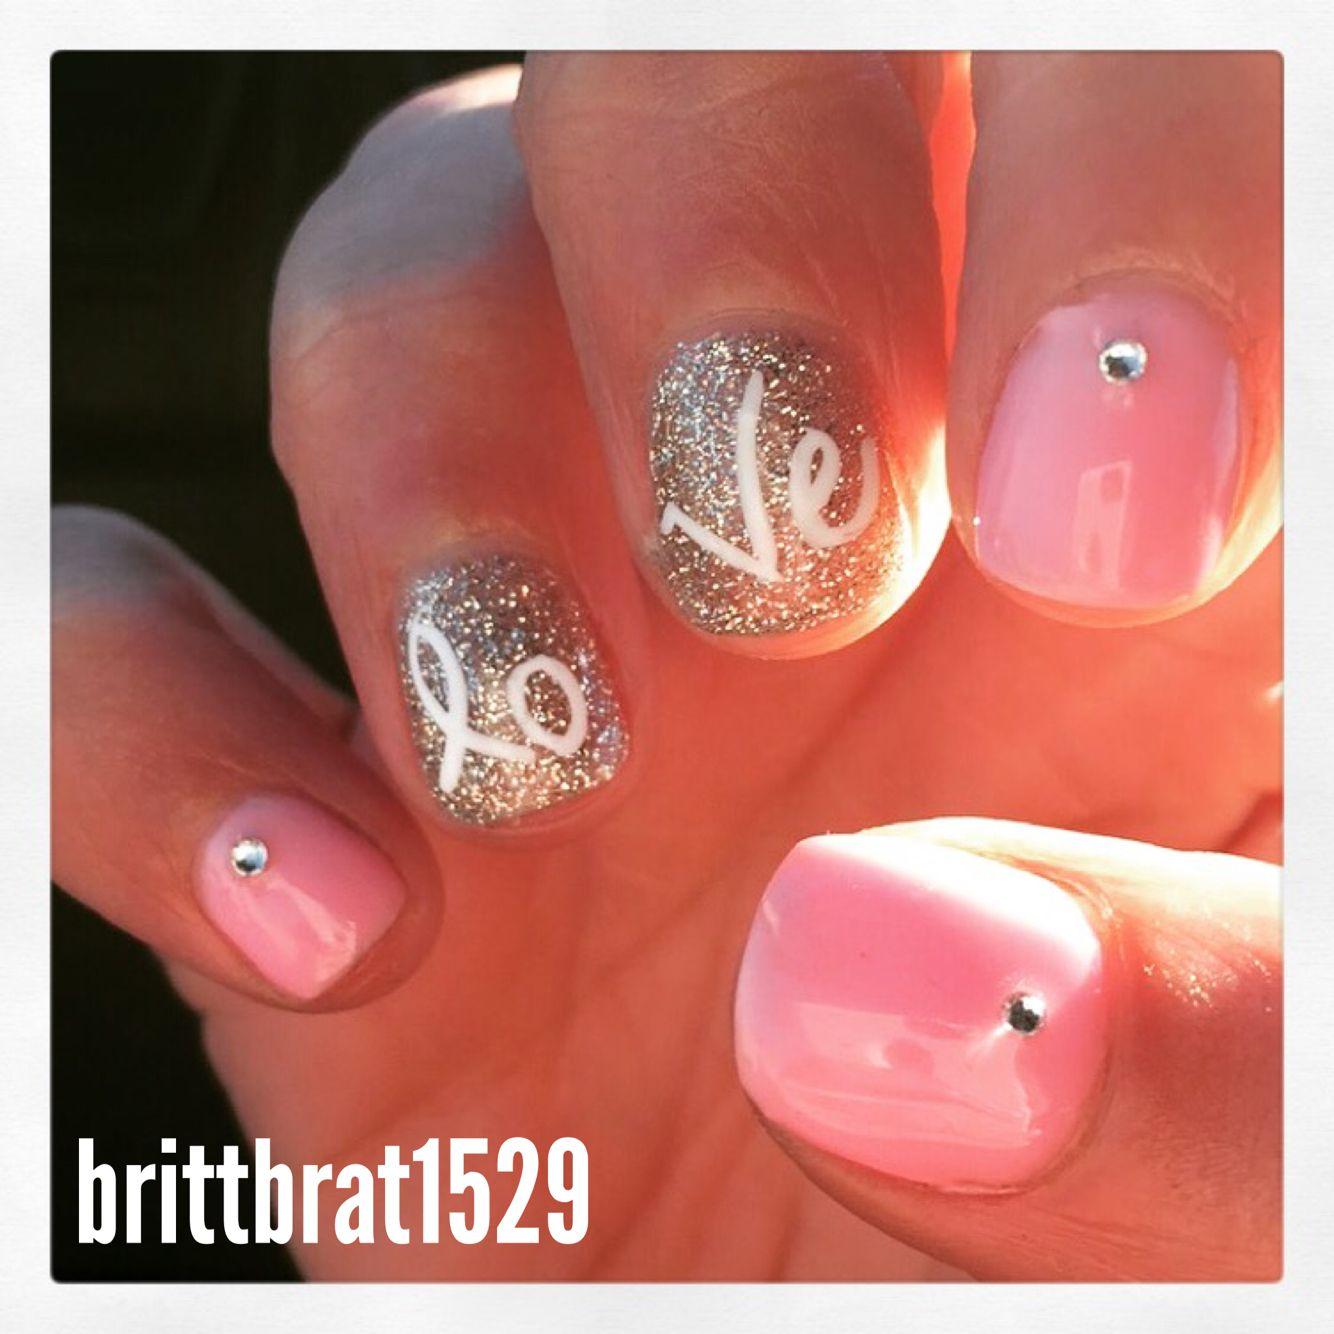 2015 Valentine\'s Day manicure gel nails design | Nails | Pinterest ...